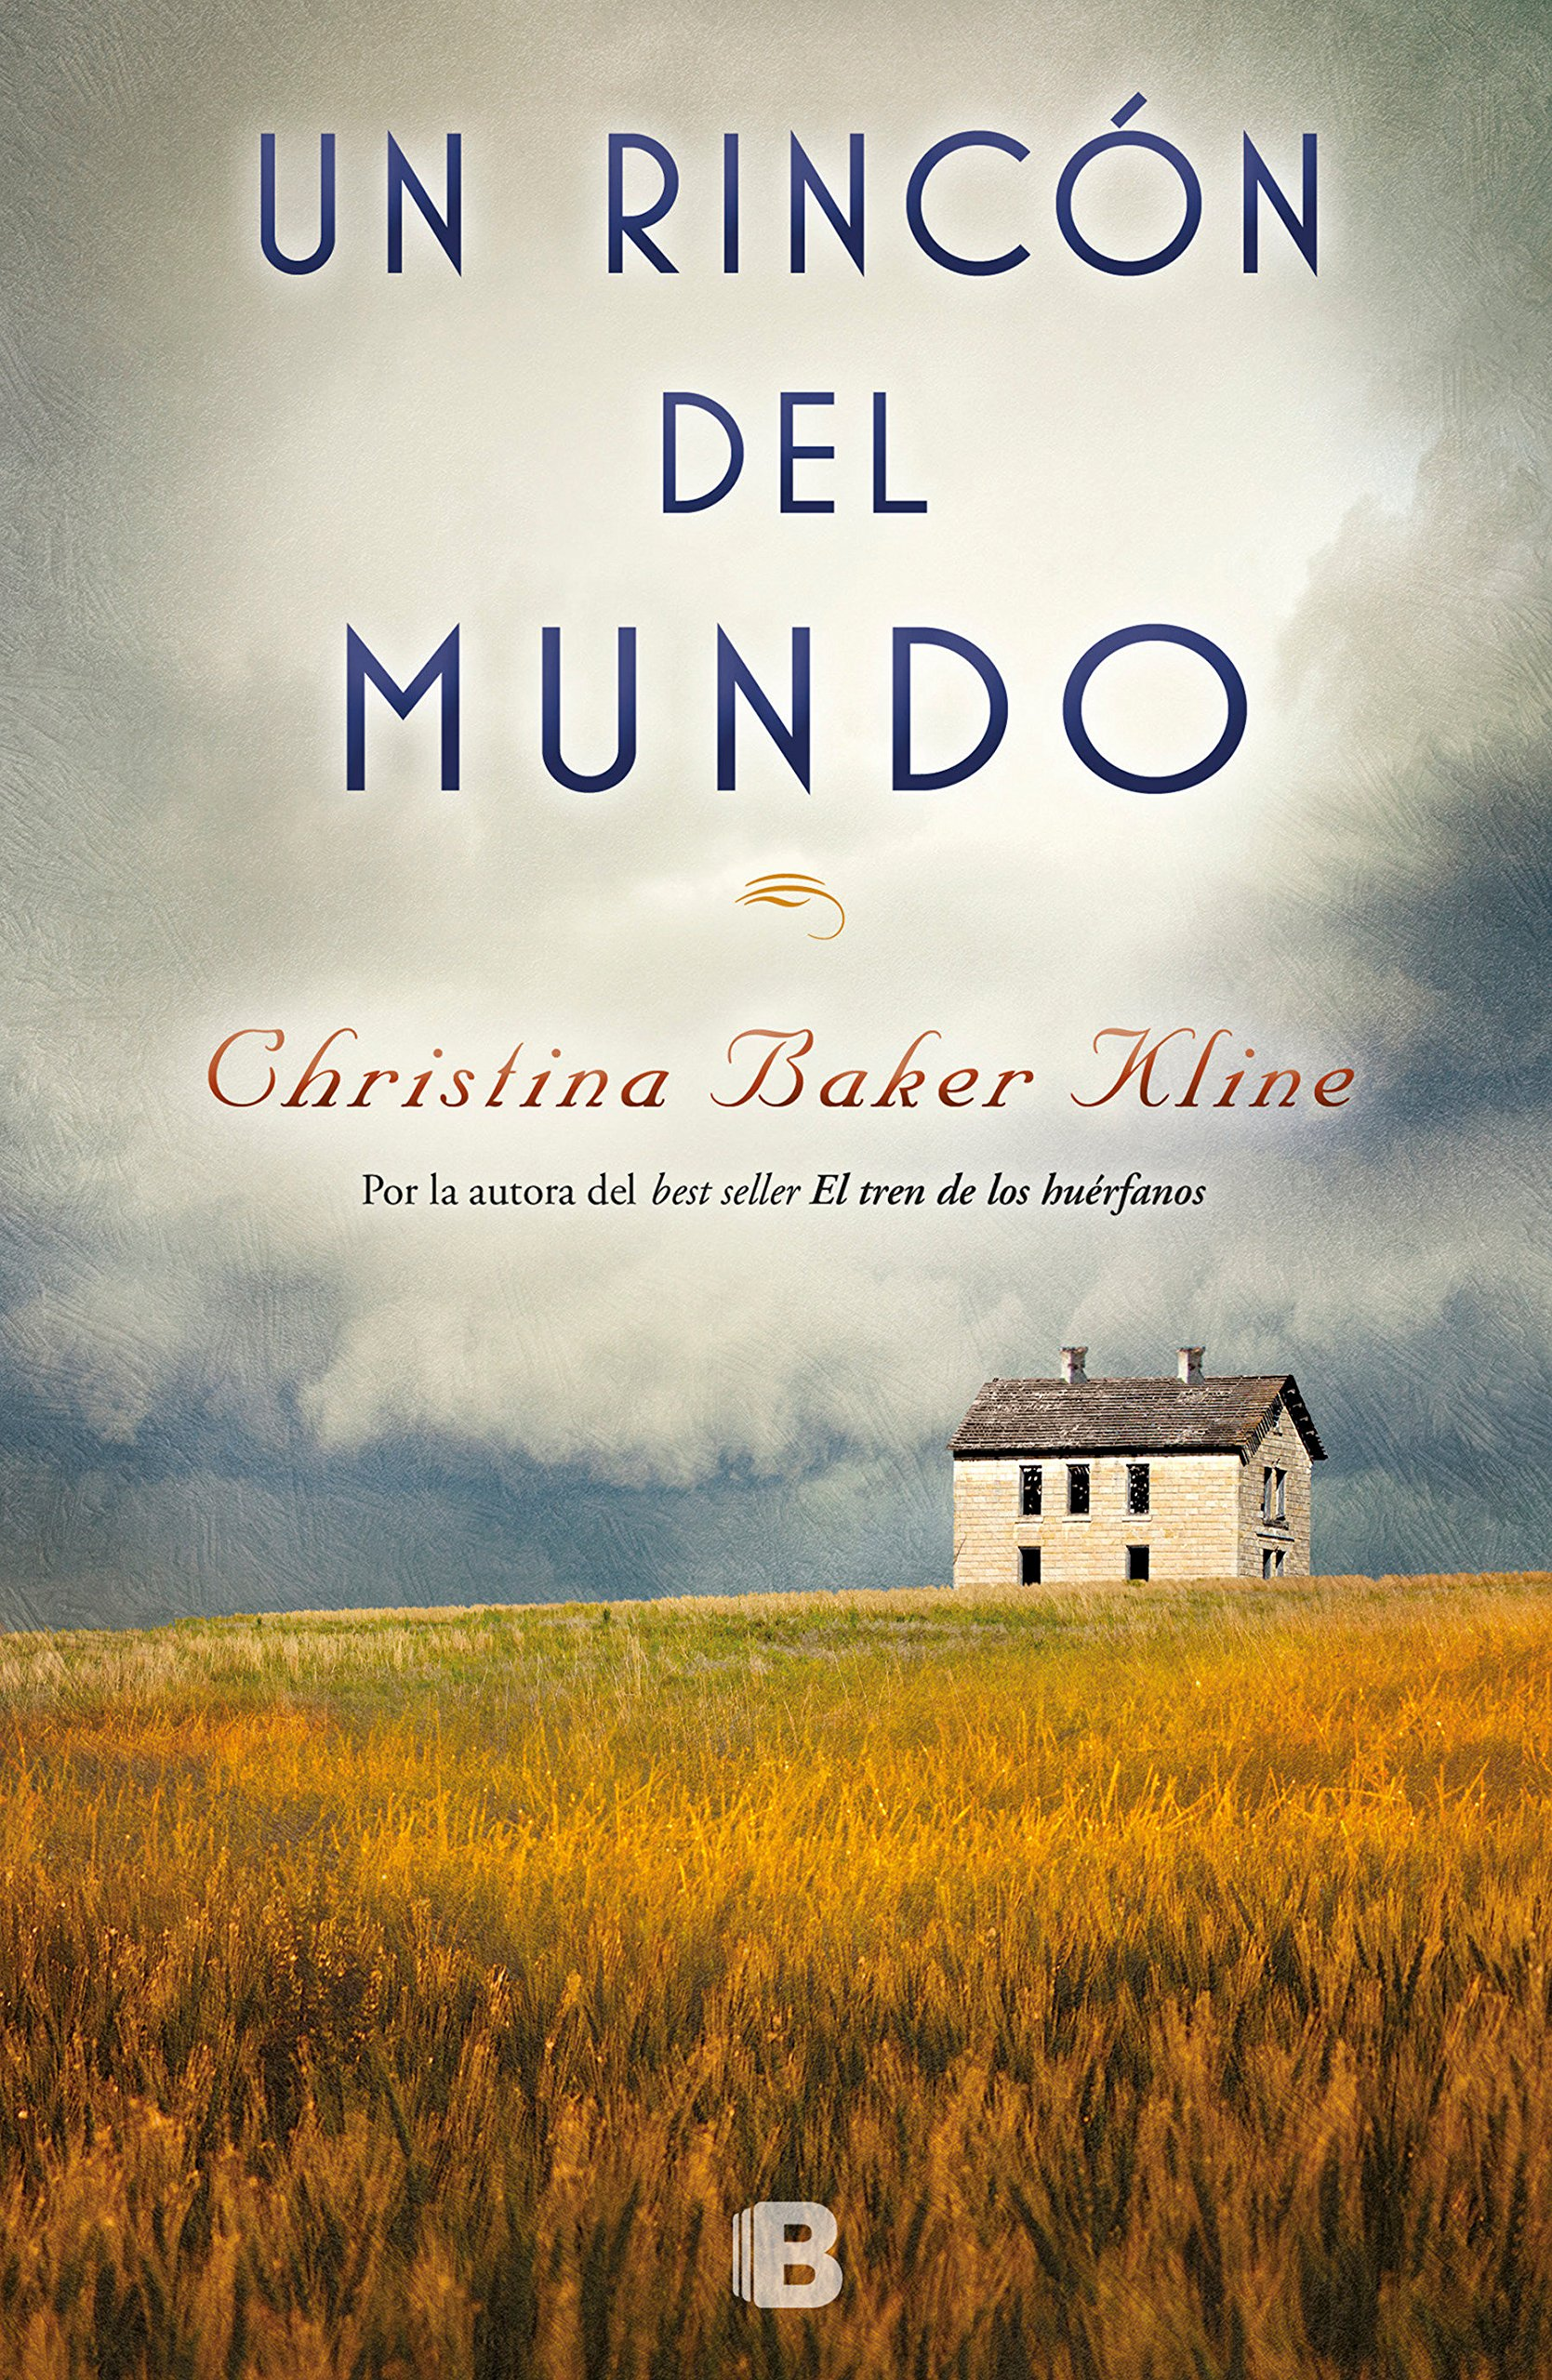 Un rincón del mundo (Grandes novelas) Tapa blanda – 18 oct 2017 Christina Baker Kline B (Ediciones B) 8466662200 Biographical